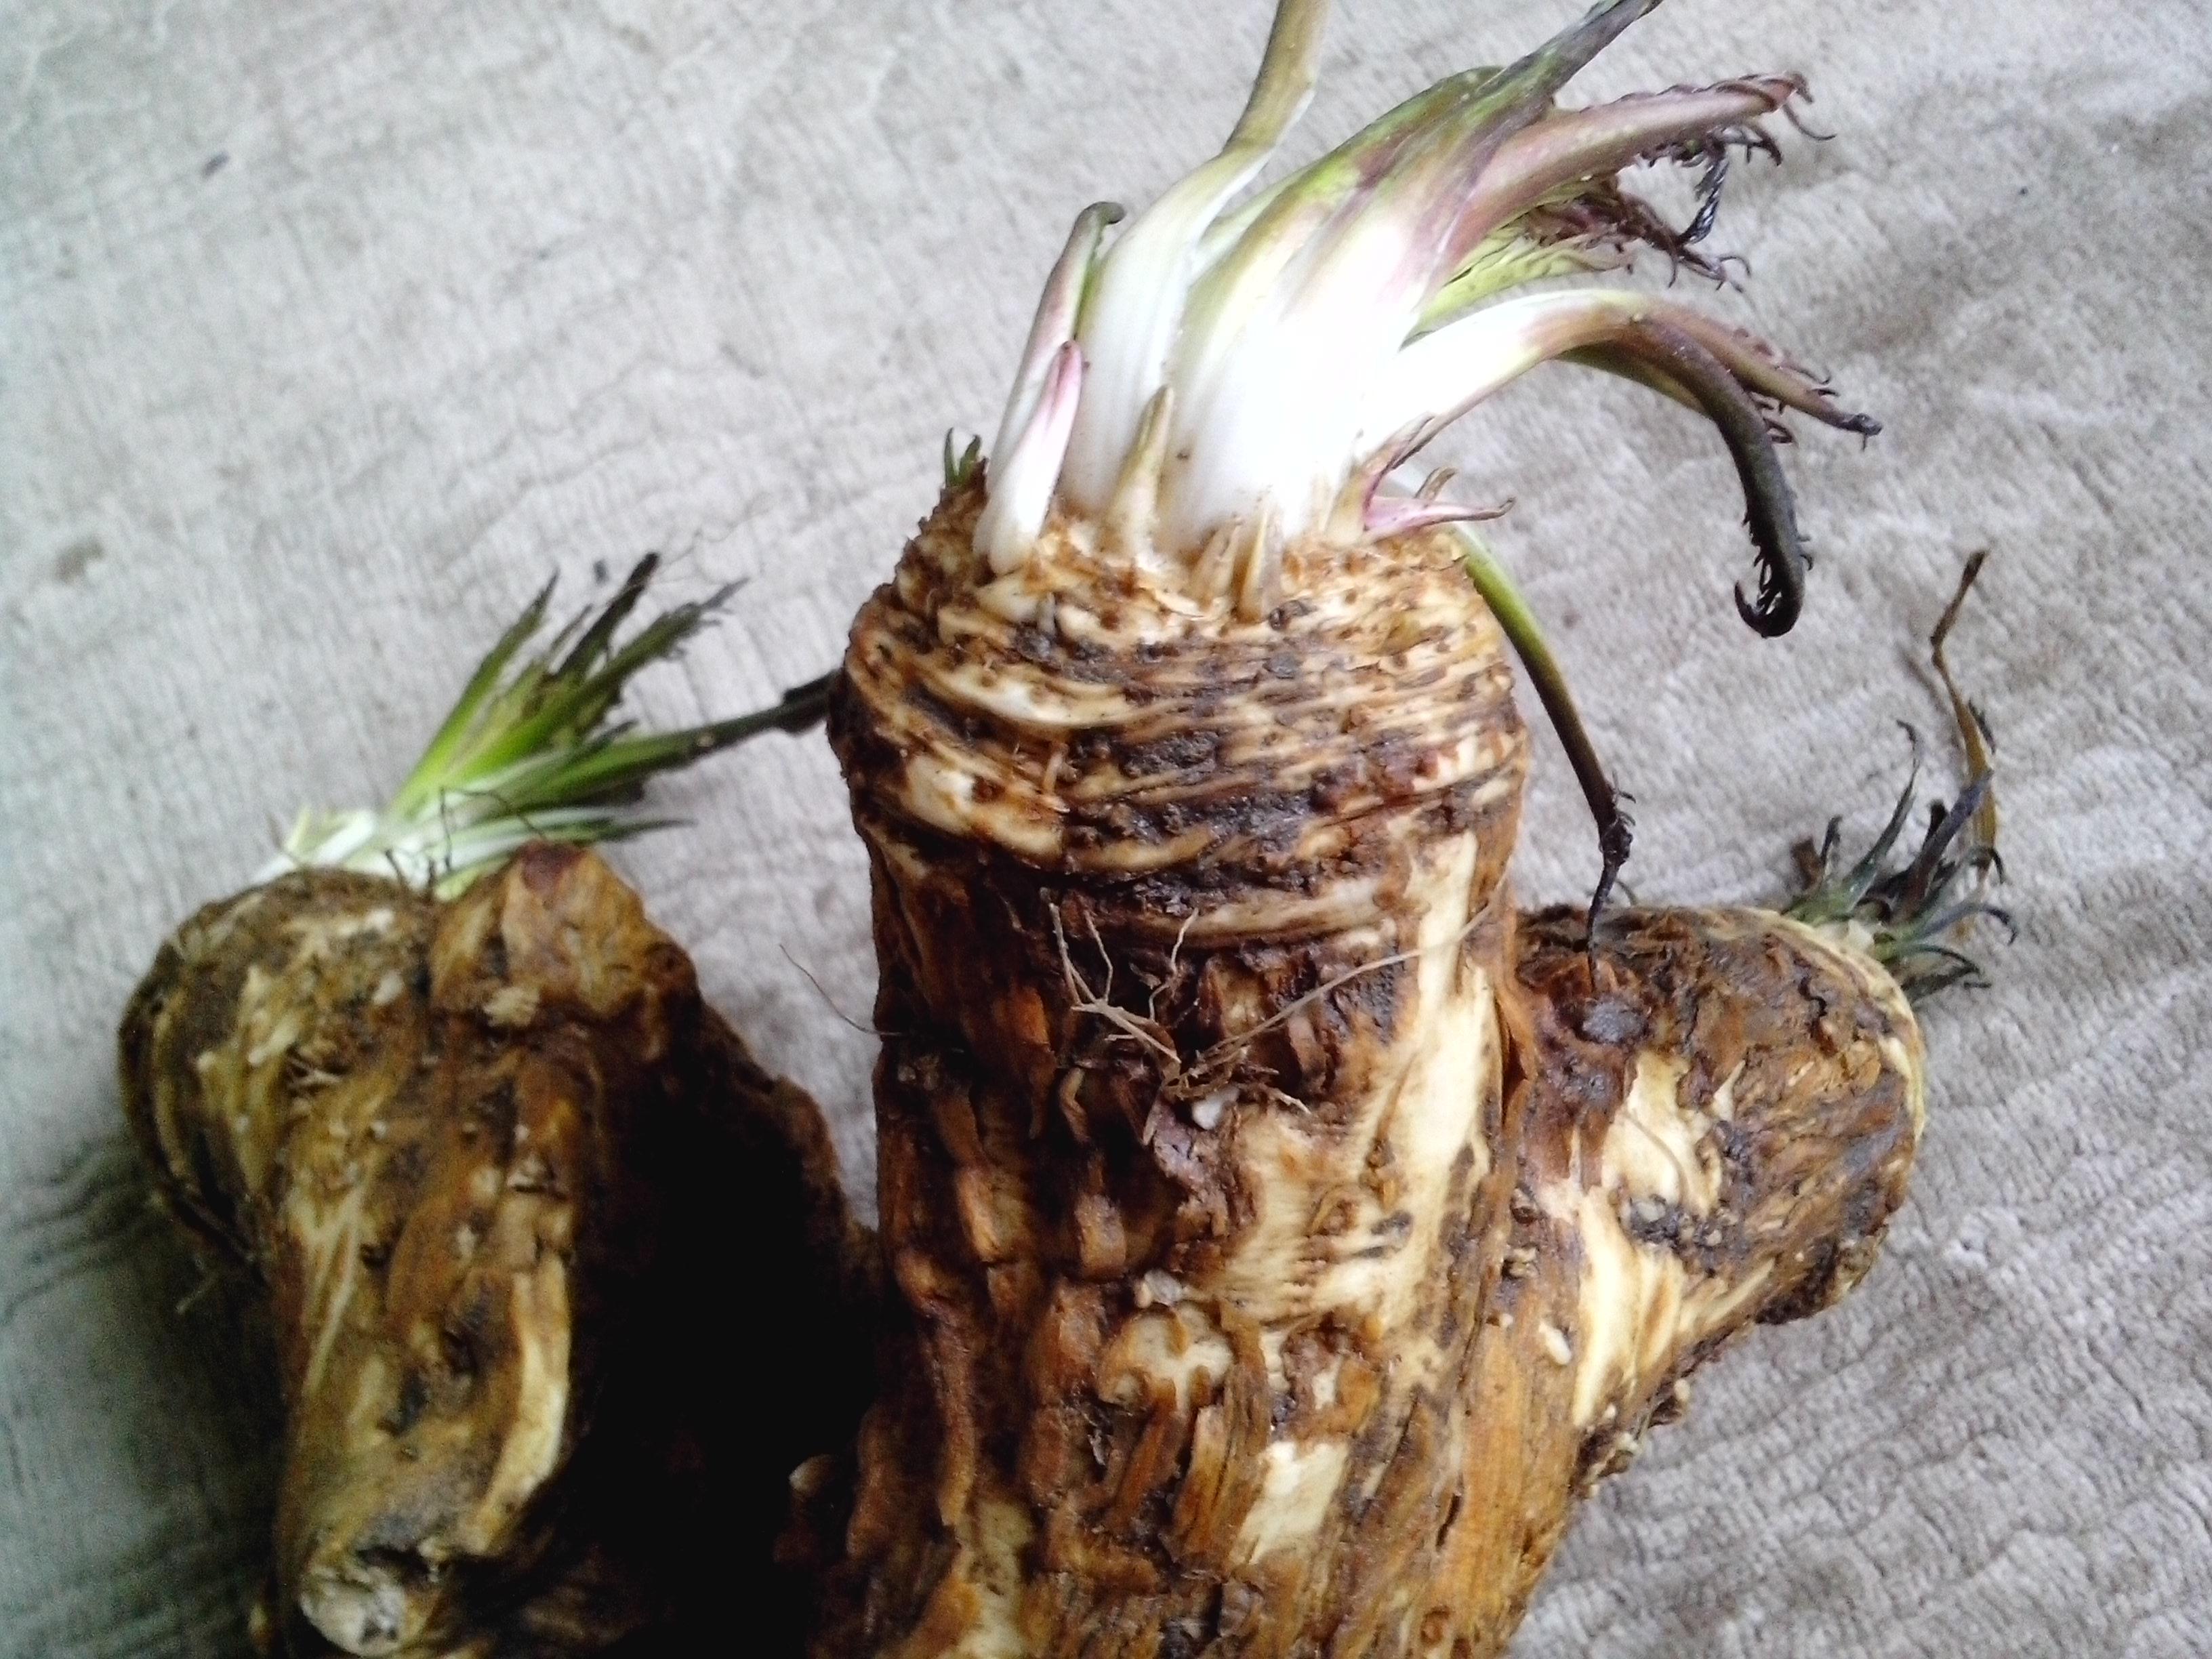 Free photograph; horseradish, plant, root, big